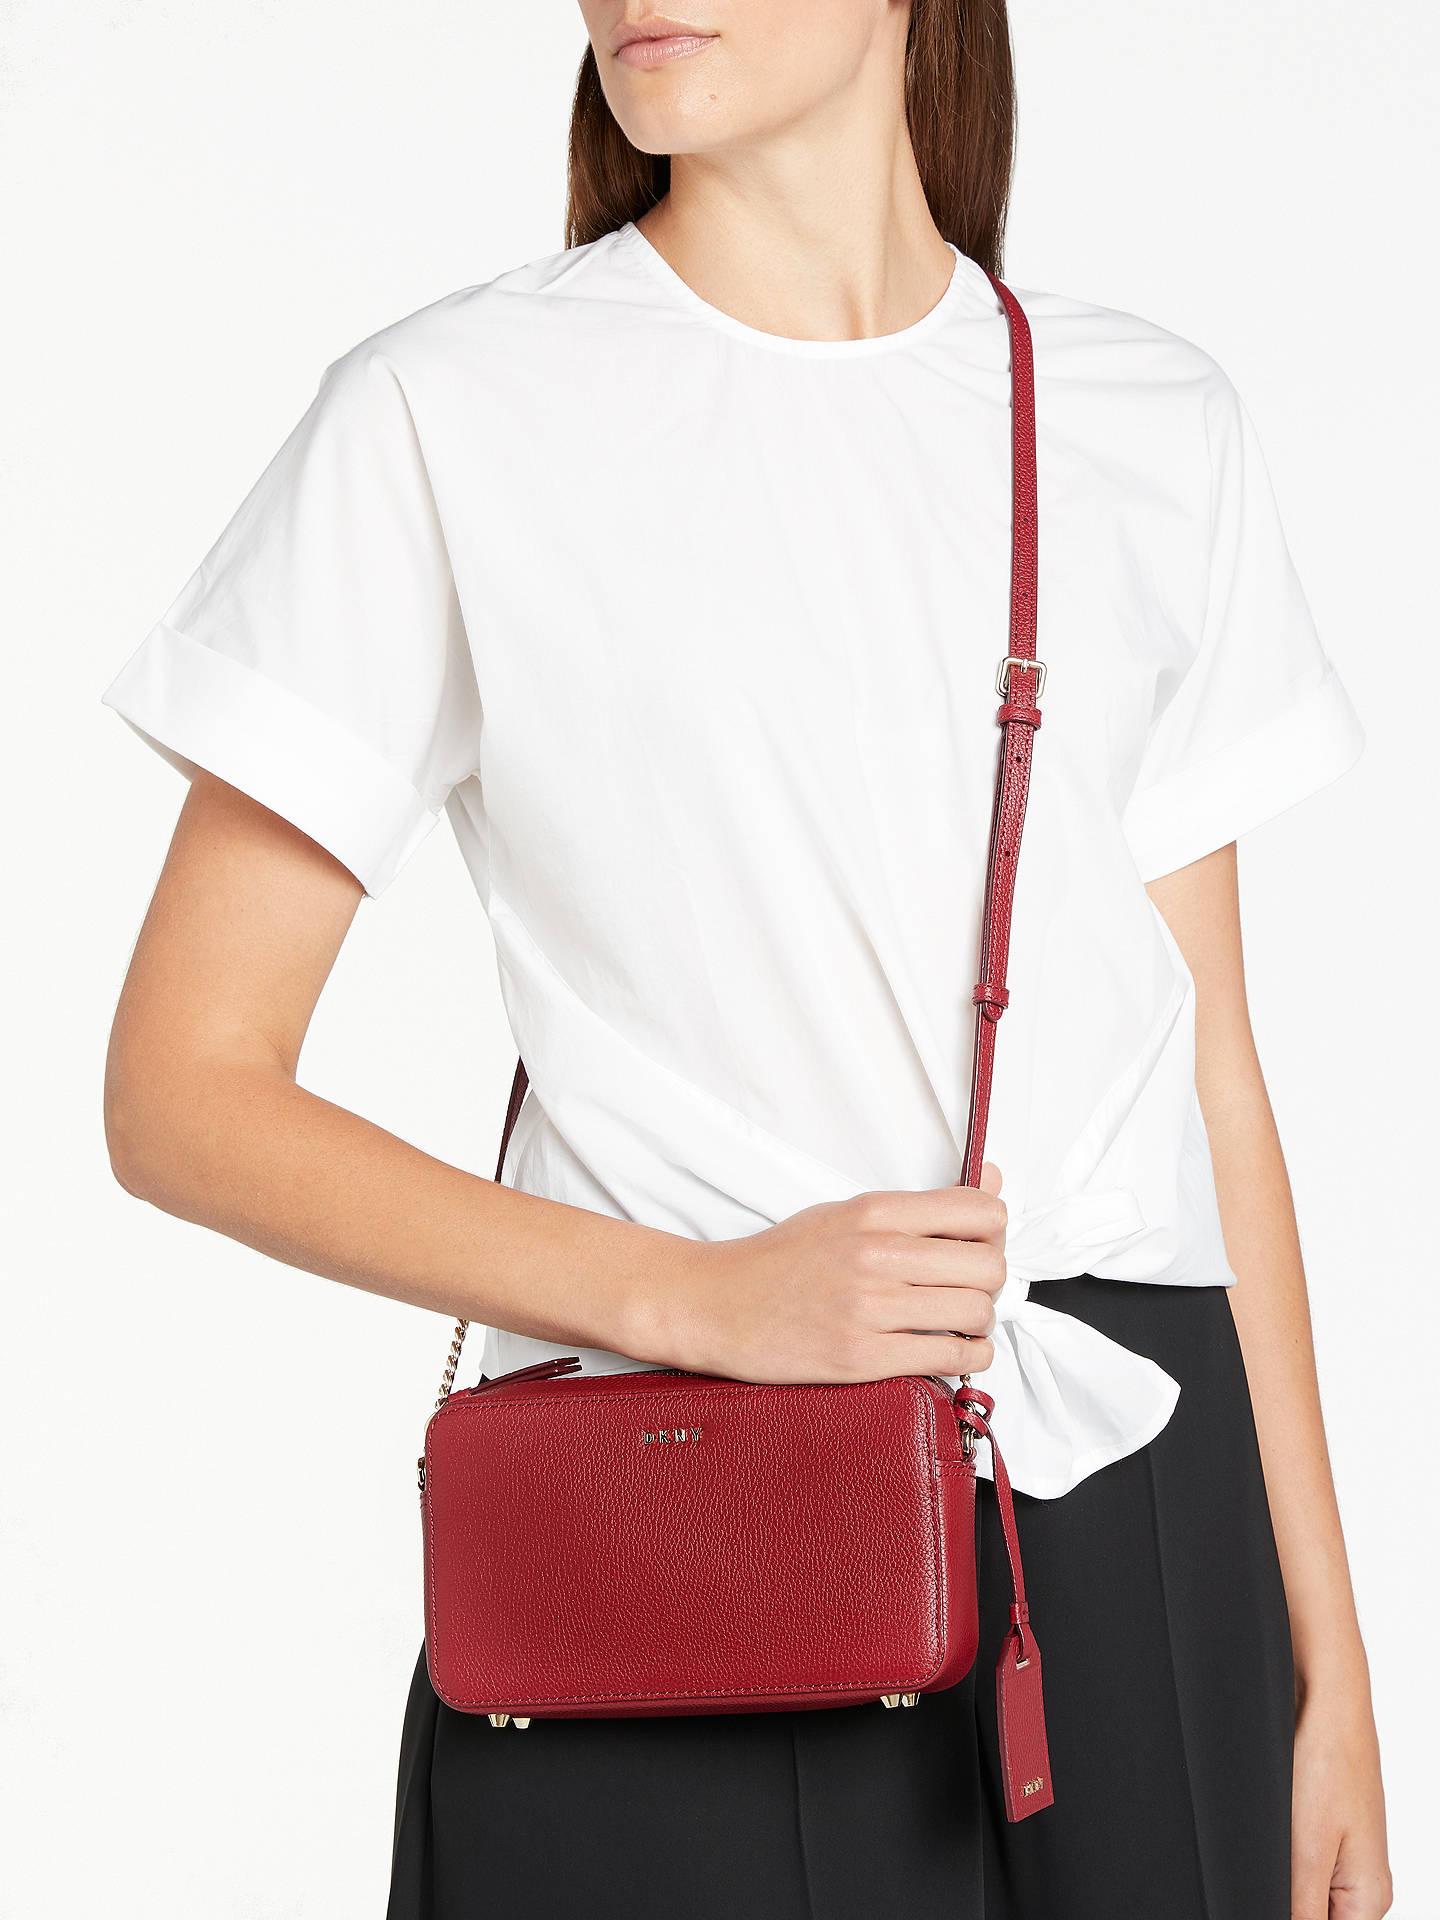 2d7105f36ea ... BuyDKNY Chelsea Pebbled Leather Cross Body Bag, Scarlet Red Online at  johnlewis.com ...